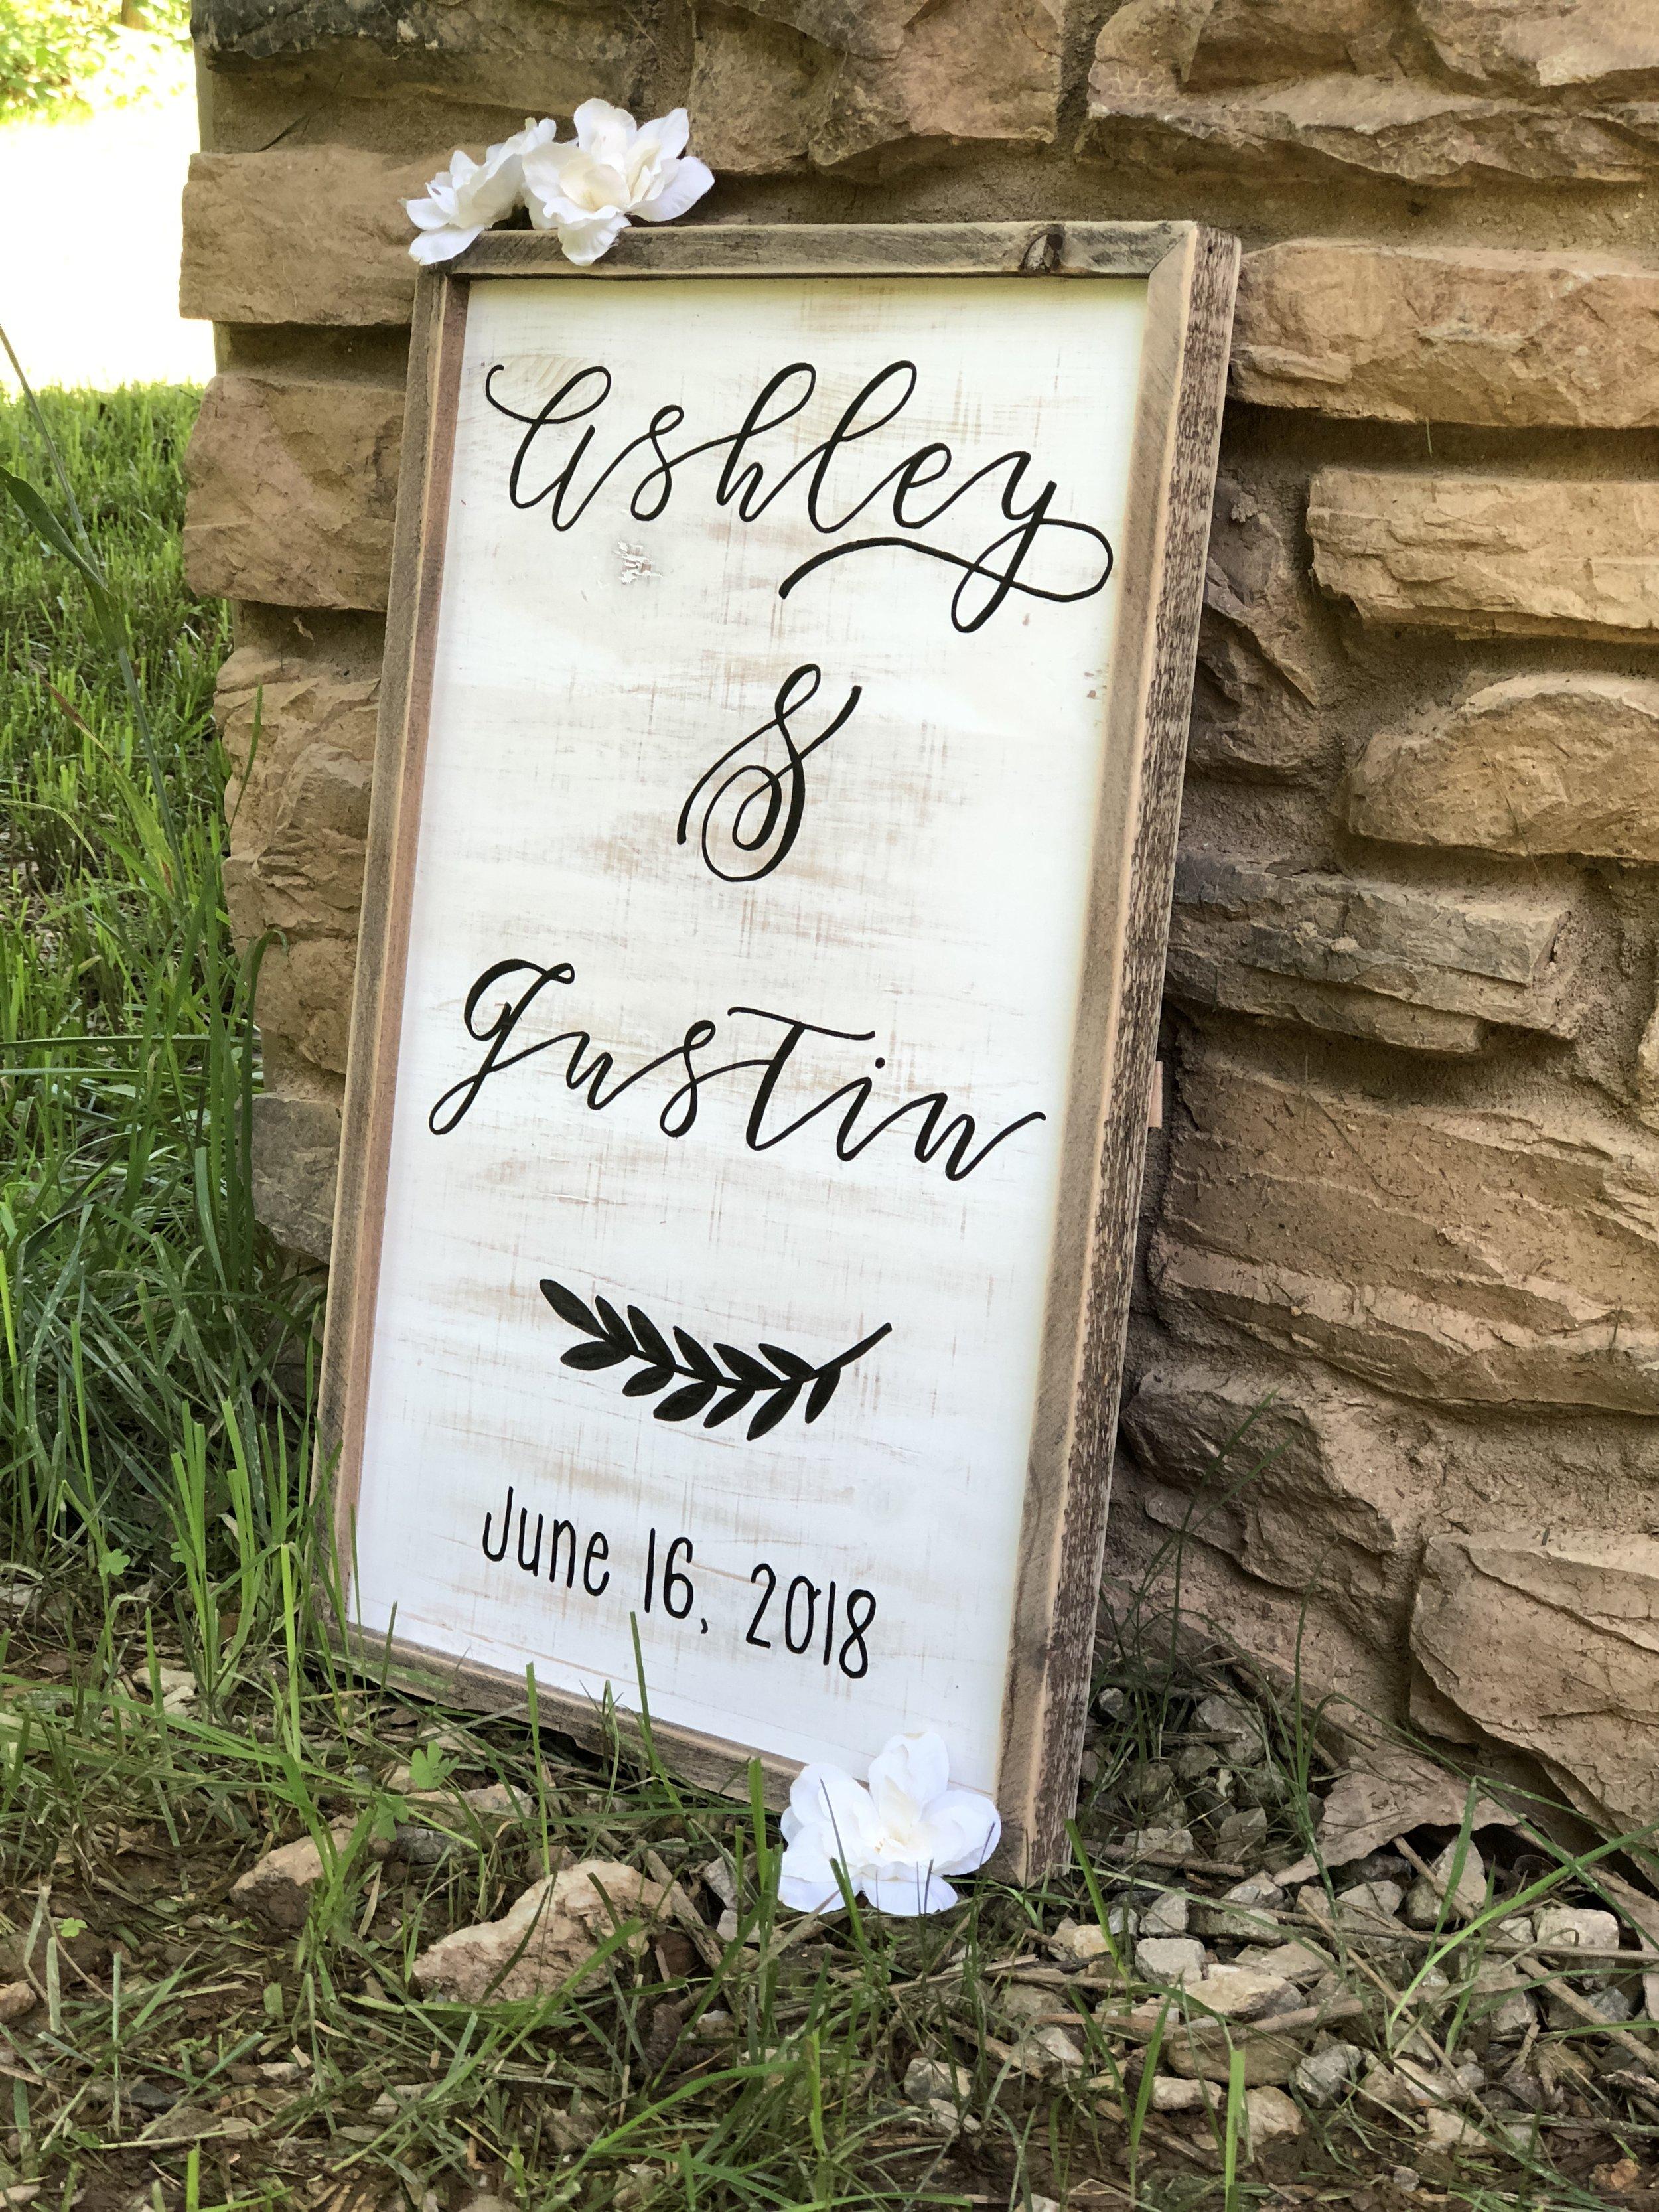 Central PA, York PA, JesSmith Designs, custom, wedding, invitations, bridal, Harrisburg, hanover, calligraphy, baltimore, wedding invitations, lancaster, gettysburg, 06-12 14.44.07.jpg